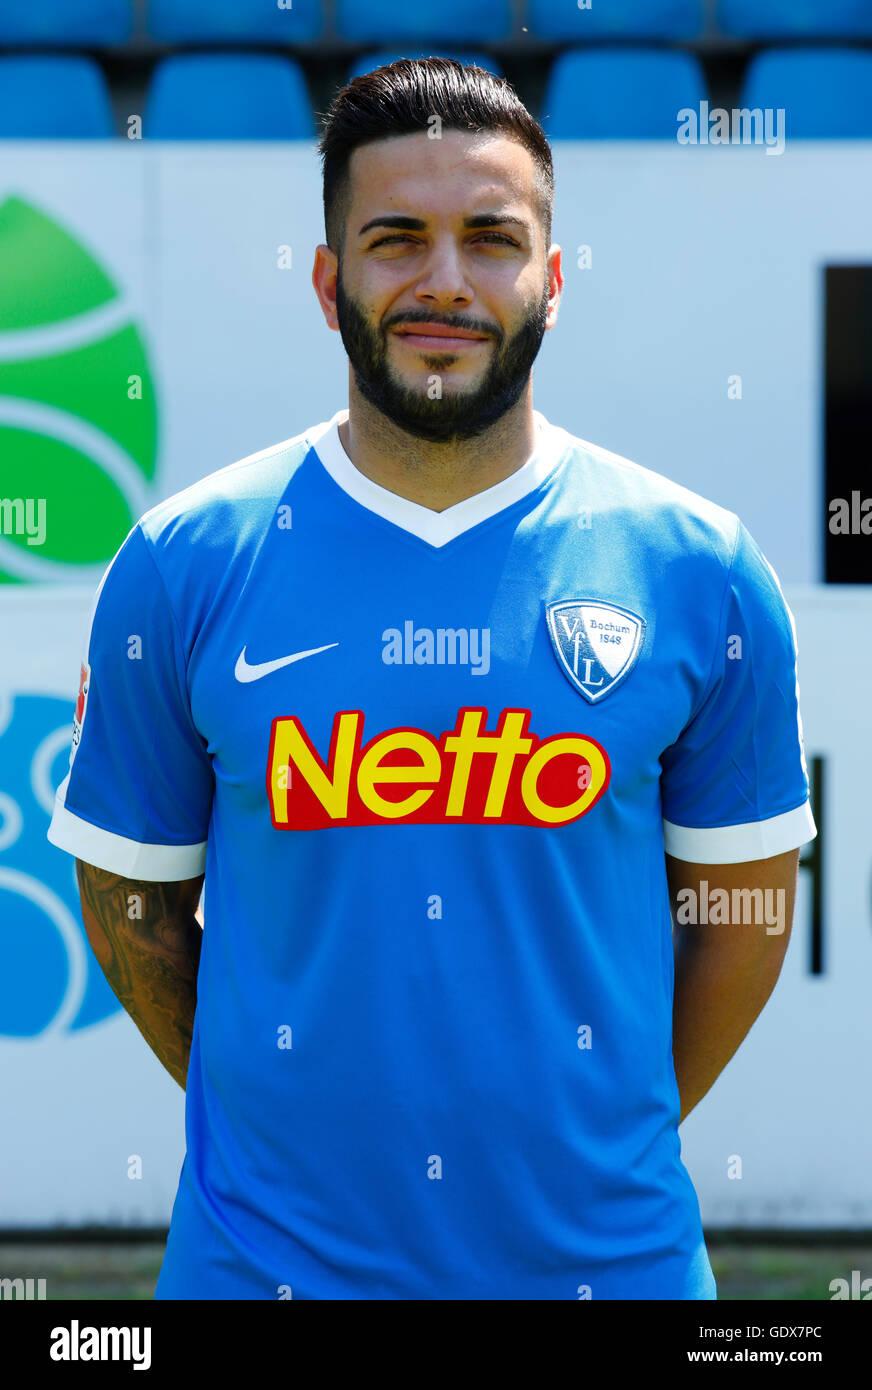 football, 2. Bundesliga, 2016/2017, VfL Bochum, team presentation for the game season, portrait Selim Guenduez - Stock Image